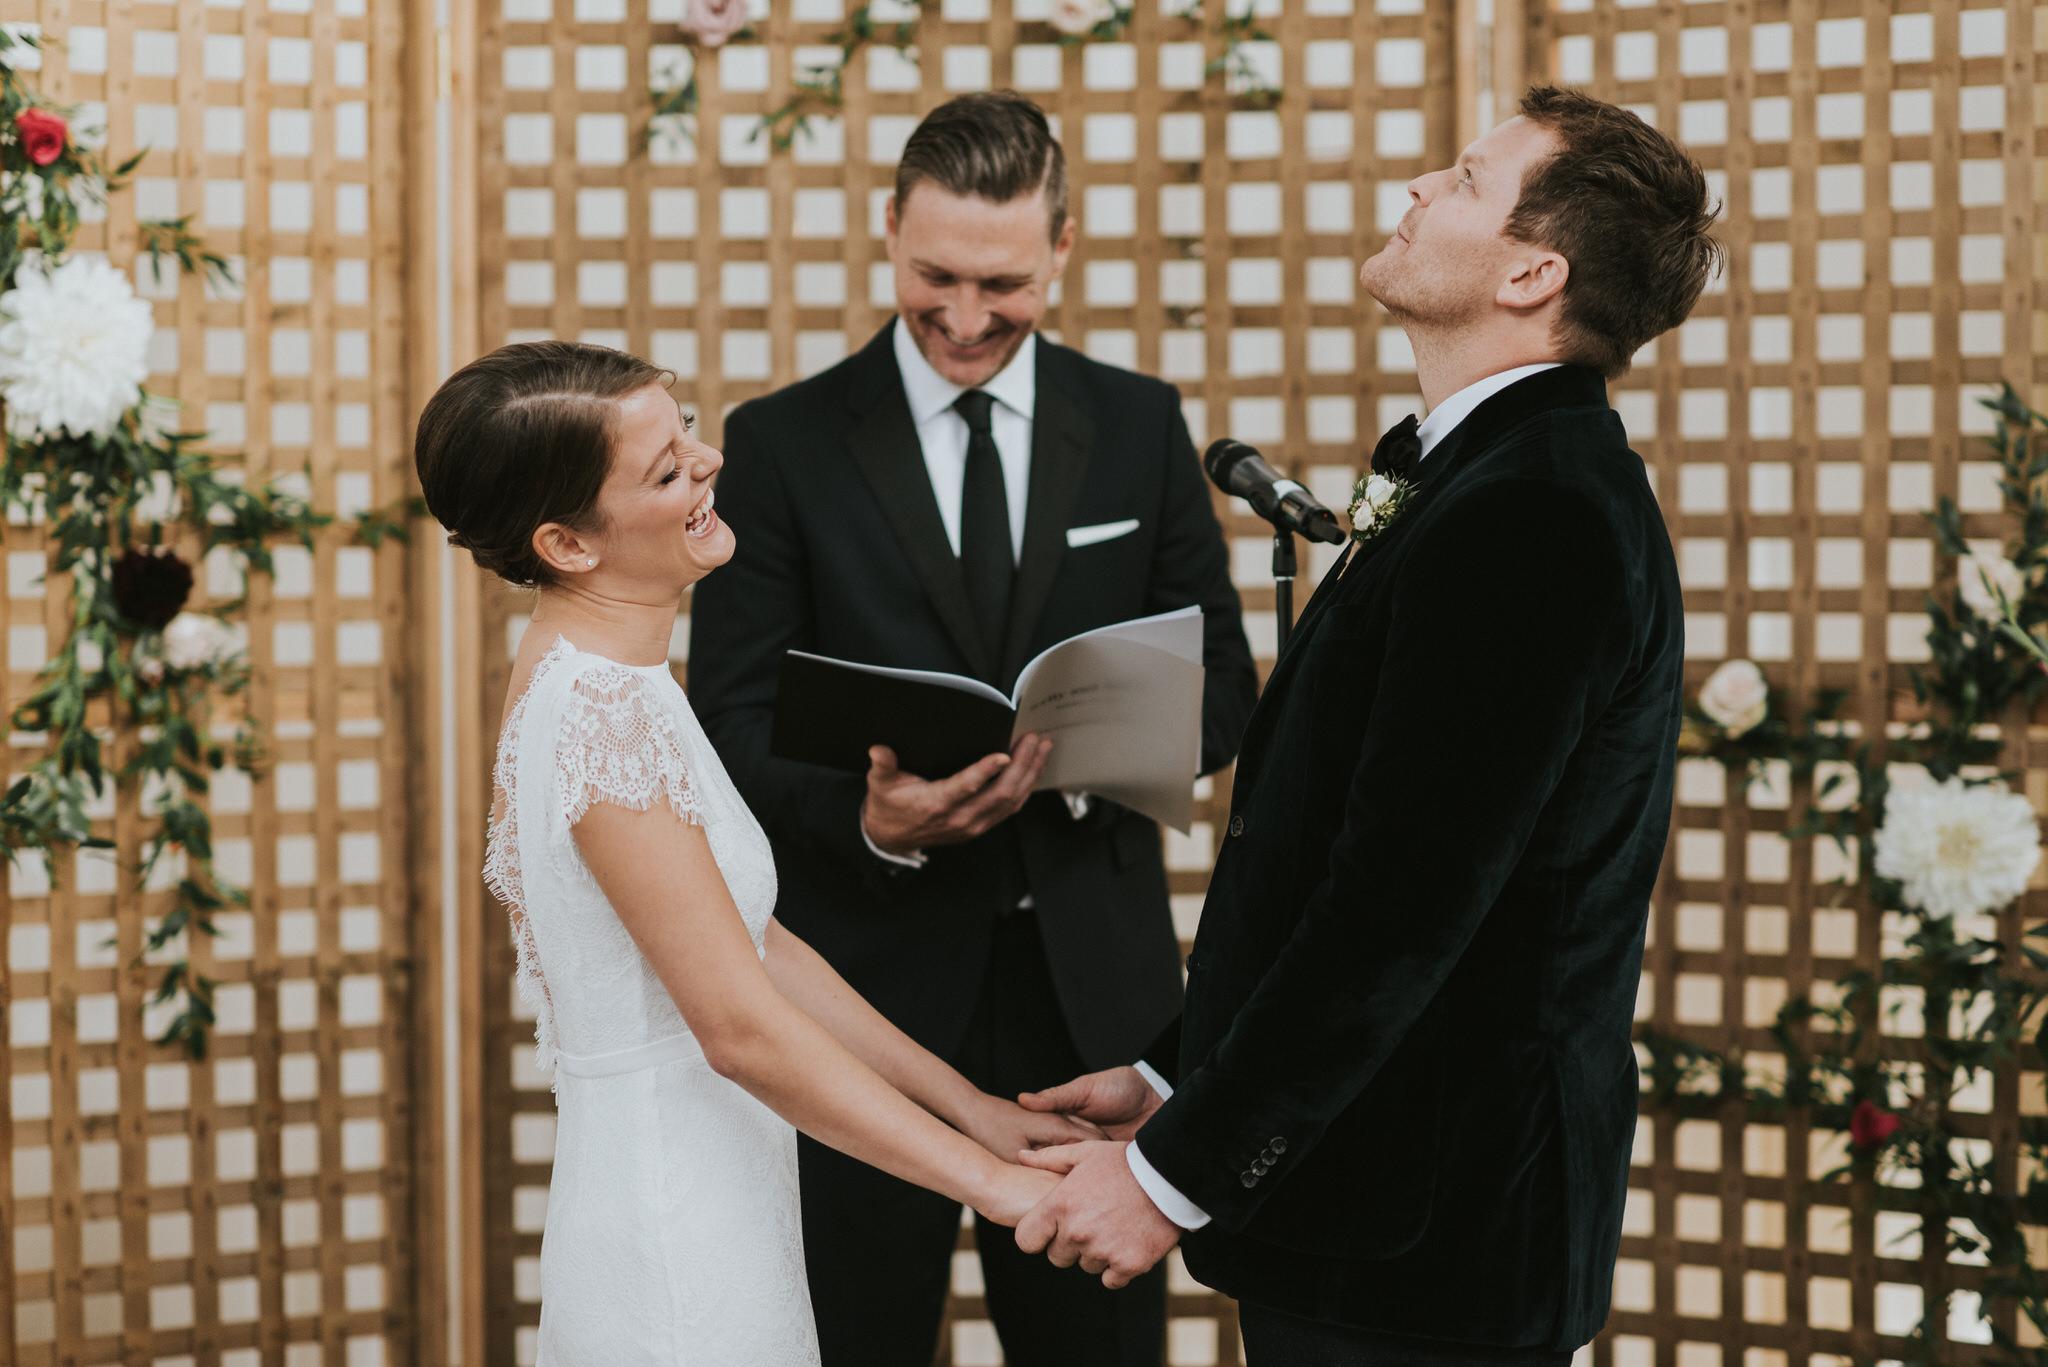 scarletoneillphotography_weddingphotography_prince edward county weddings115.JPG